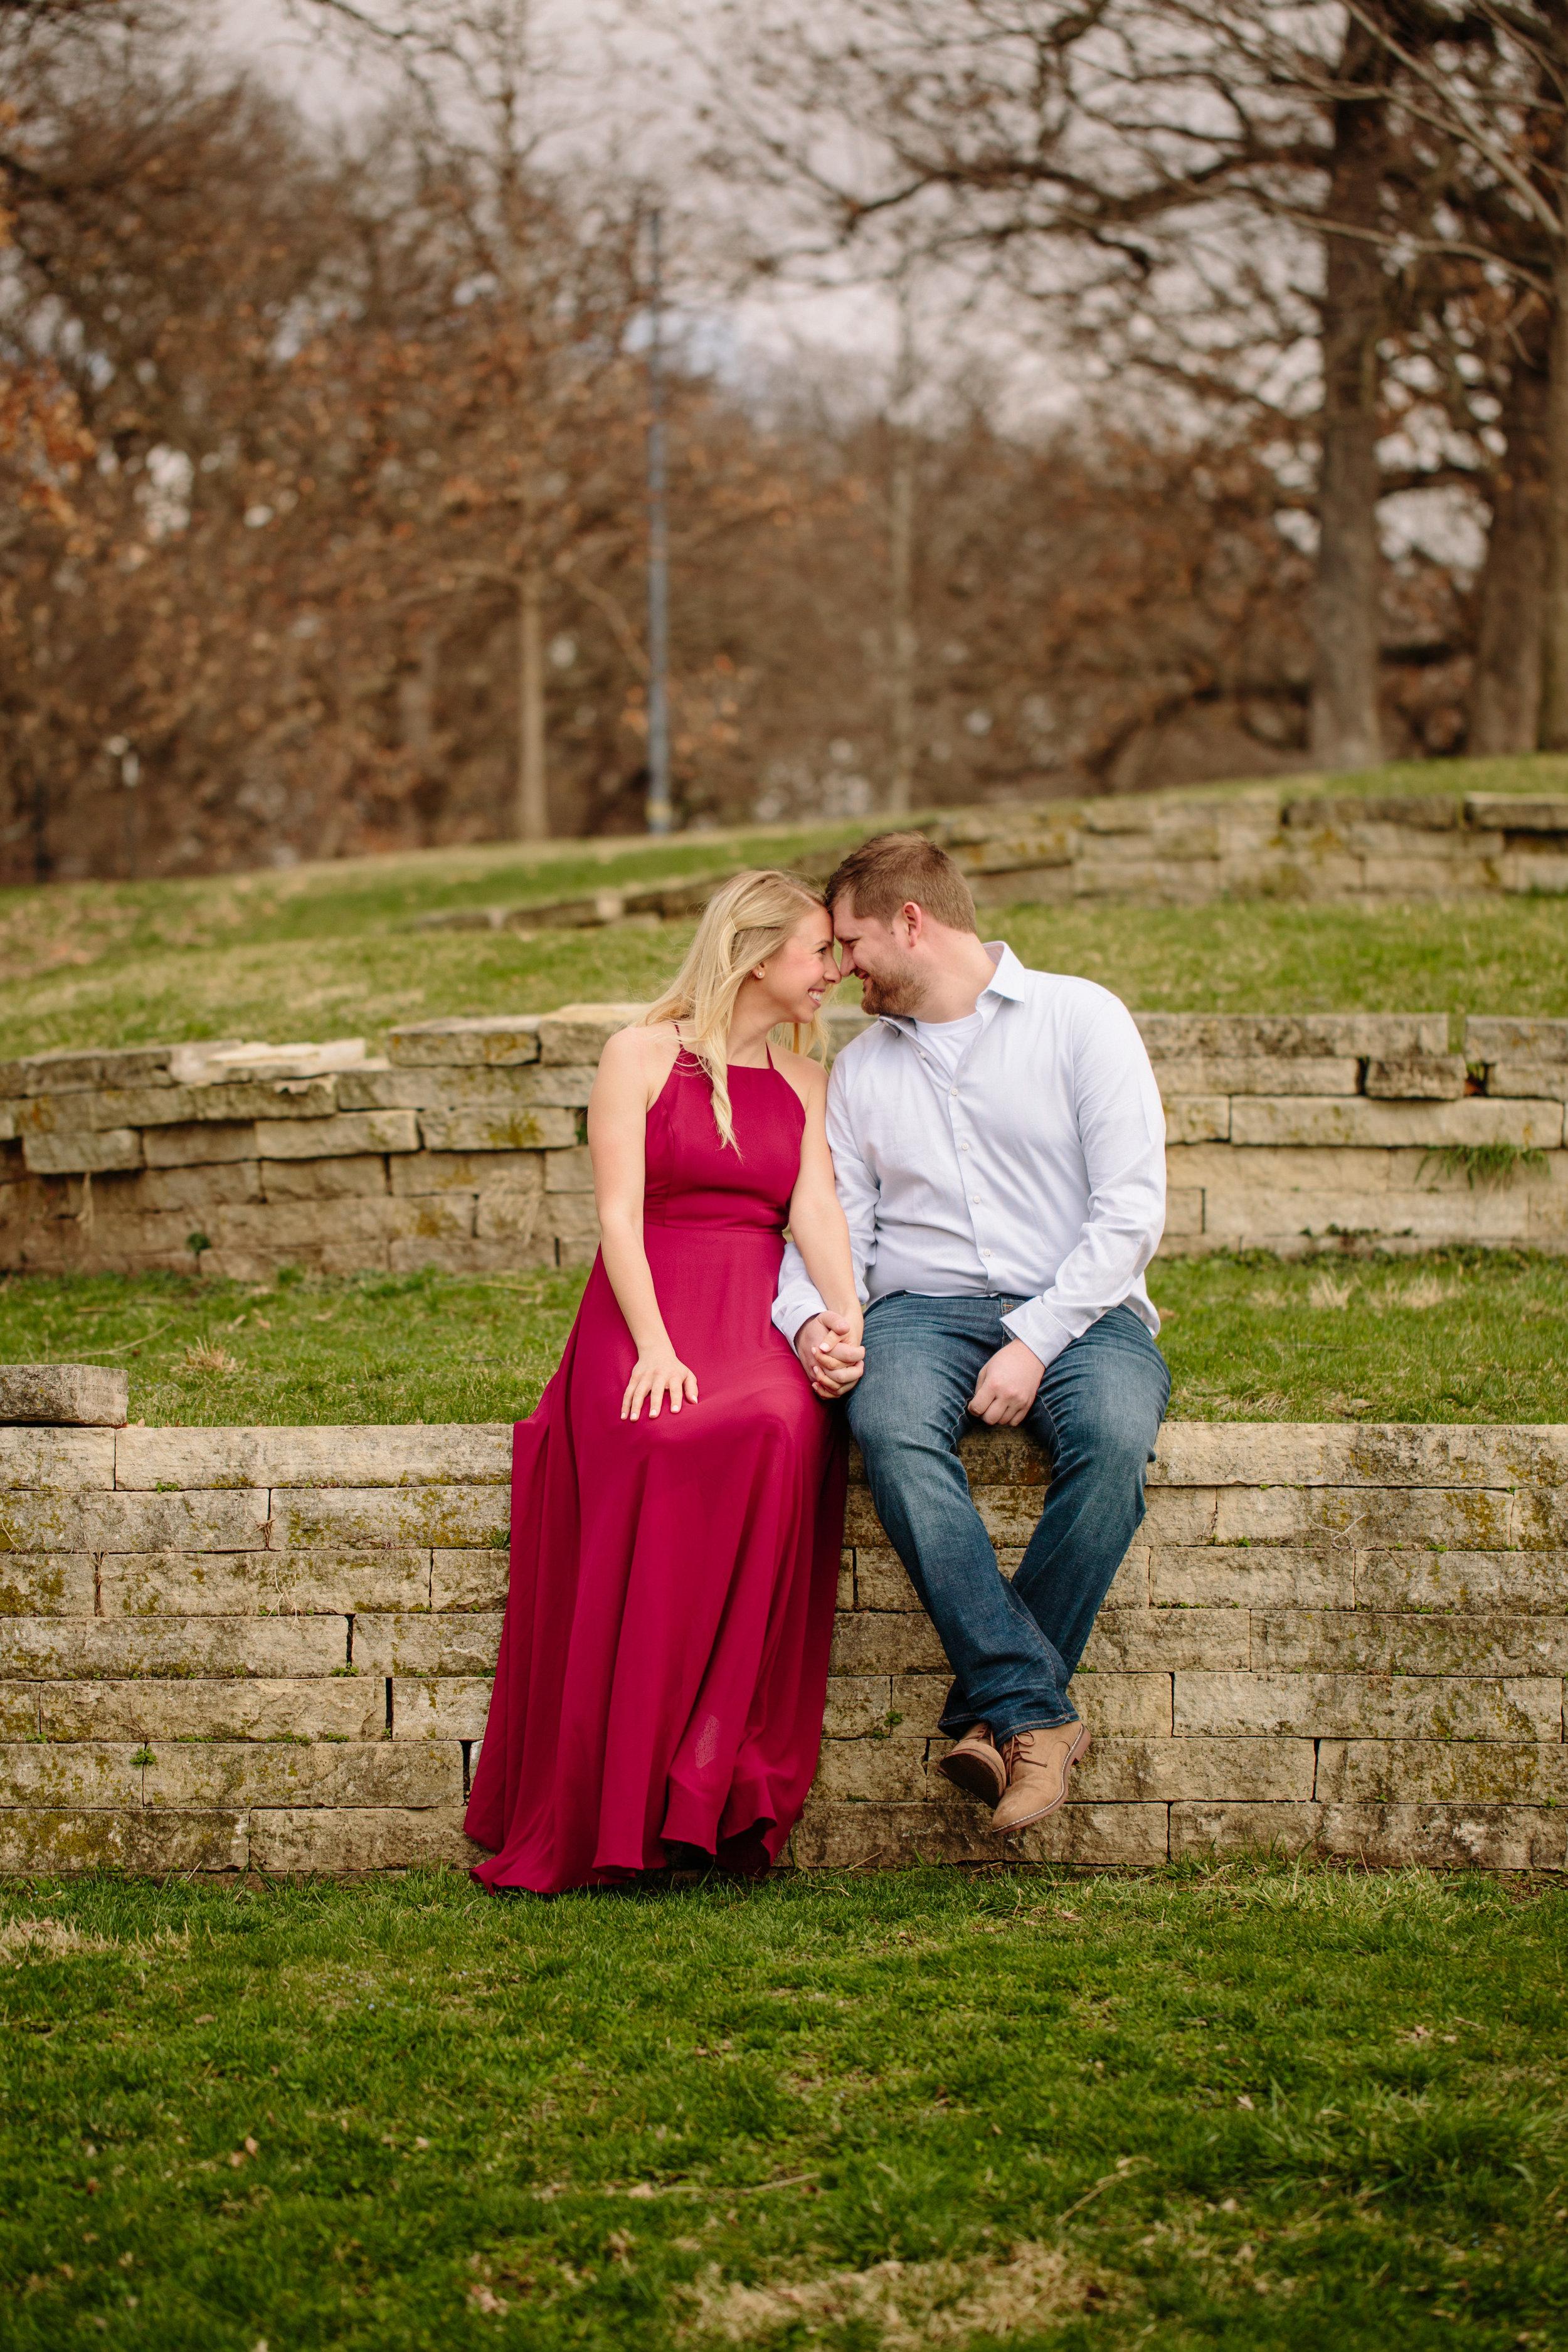 Des Moines art center rose garden engagement photos